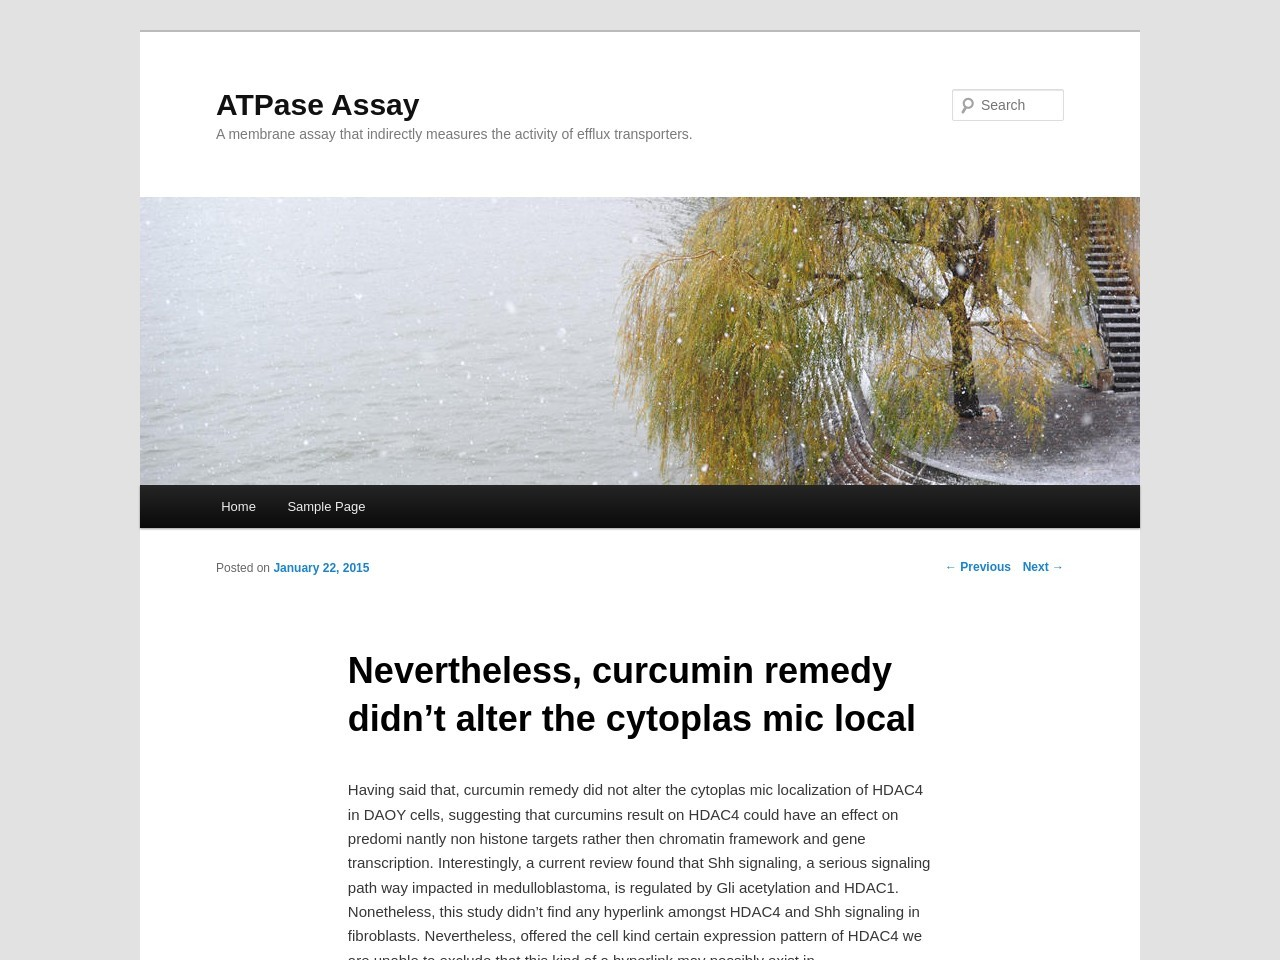 Nevertheless, curcumin remedy didn't alter the cytoplas mic …